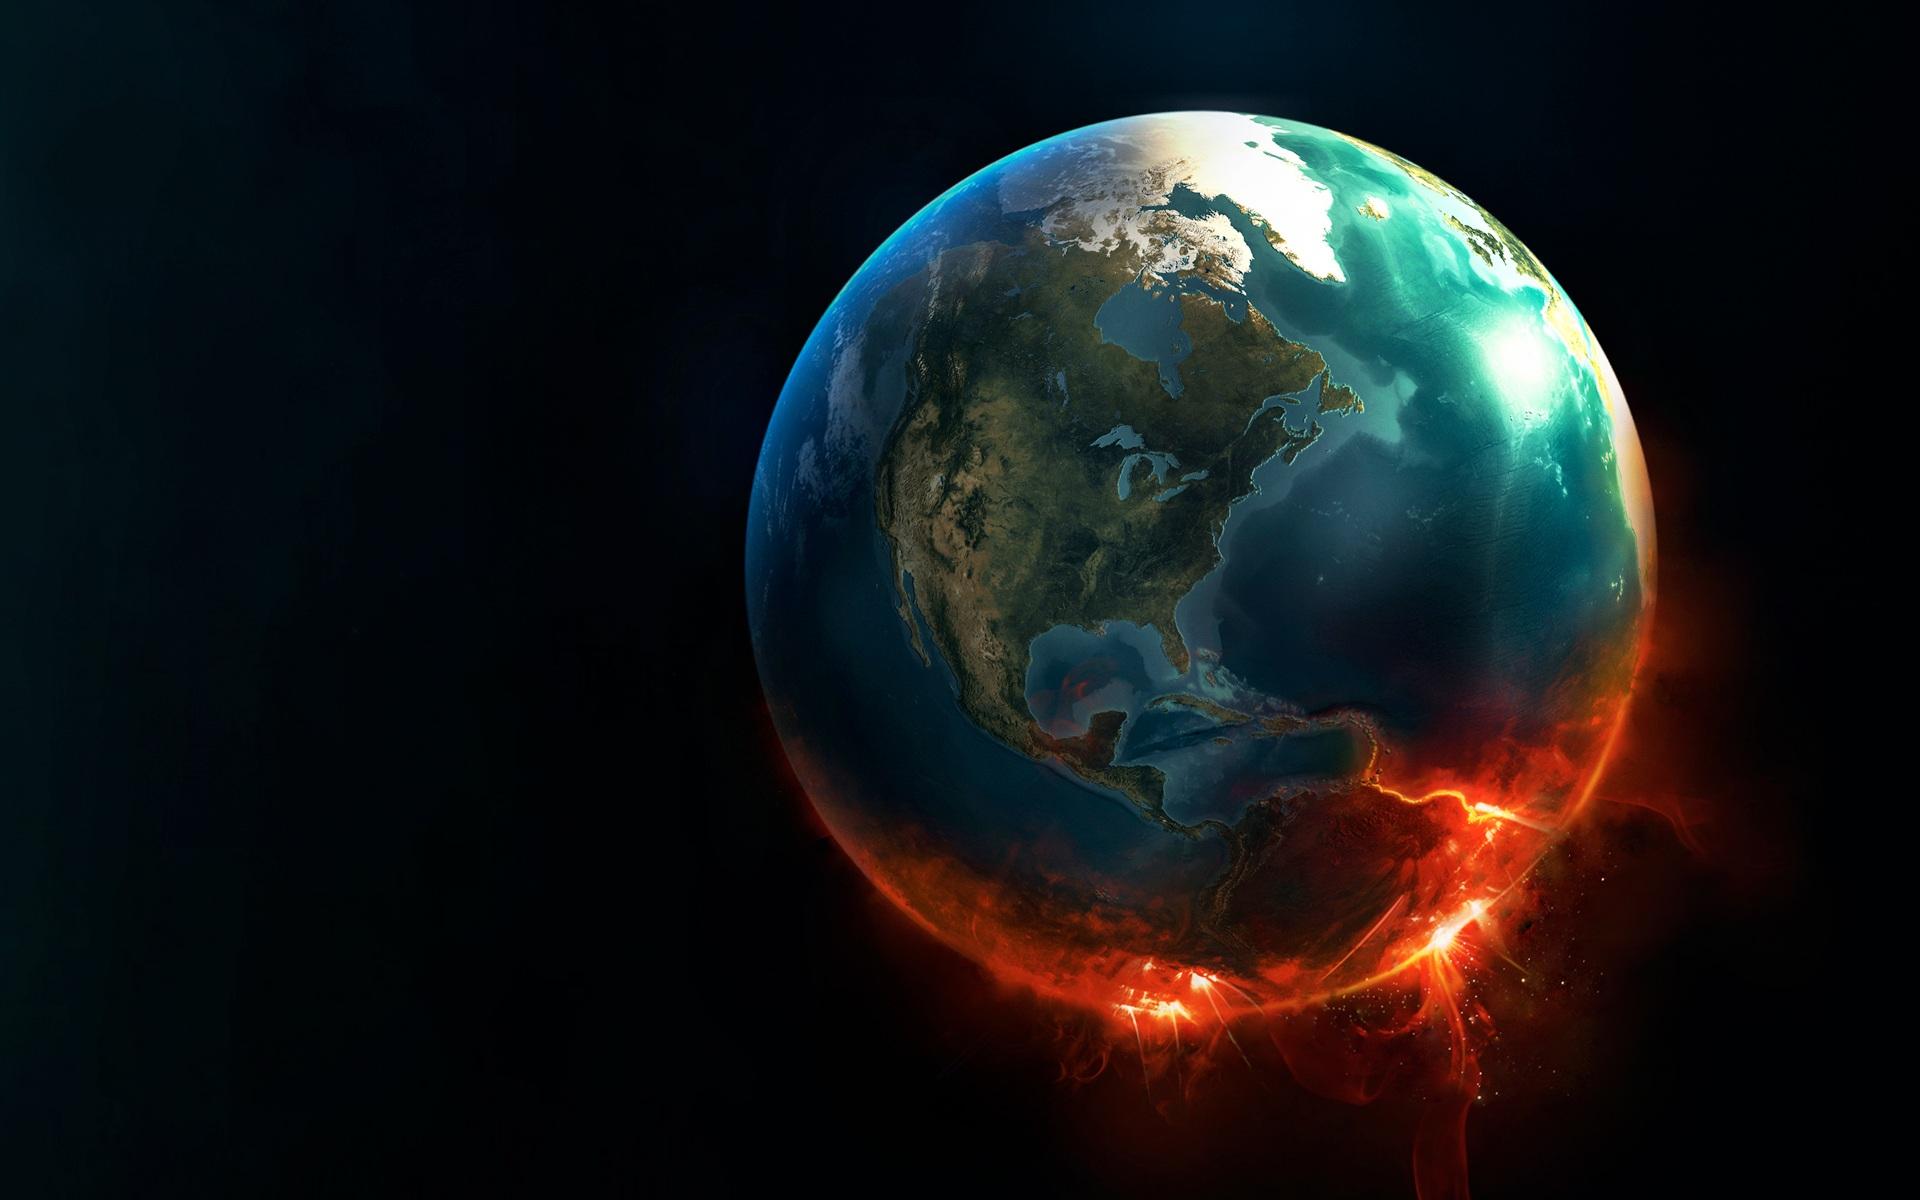 Sfondi desktop hd fantasy supernova sfondi hd gratis for Immagini hd desktop